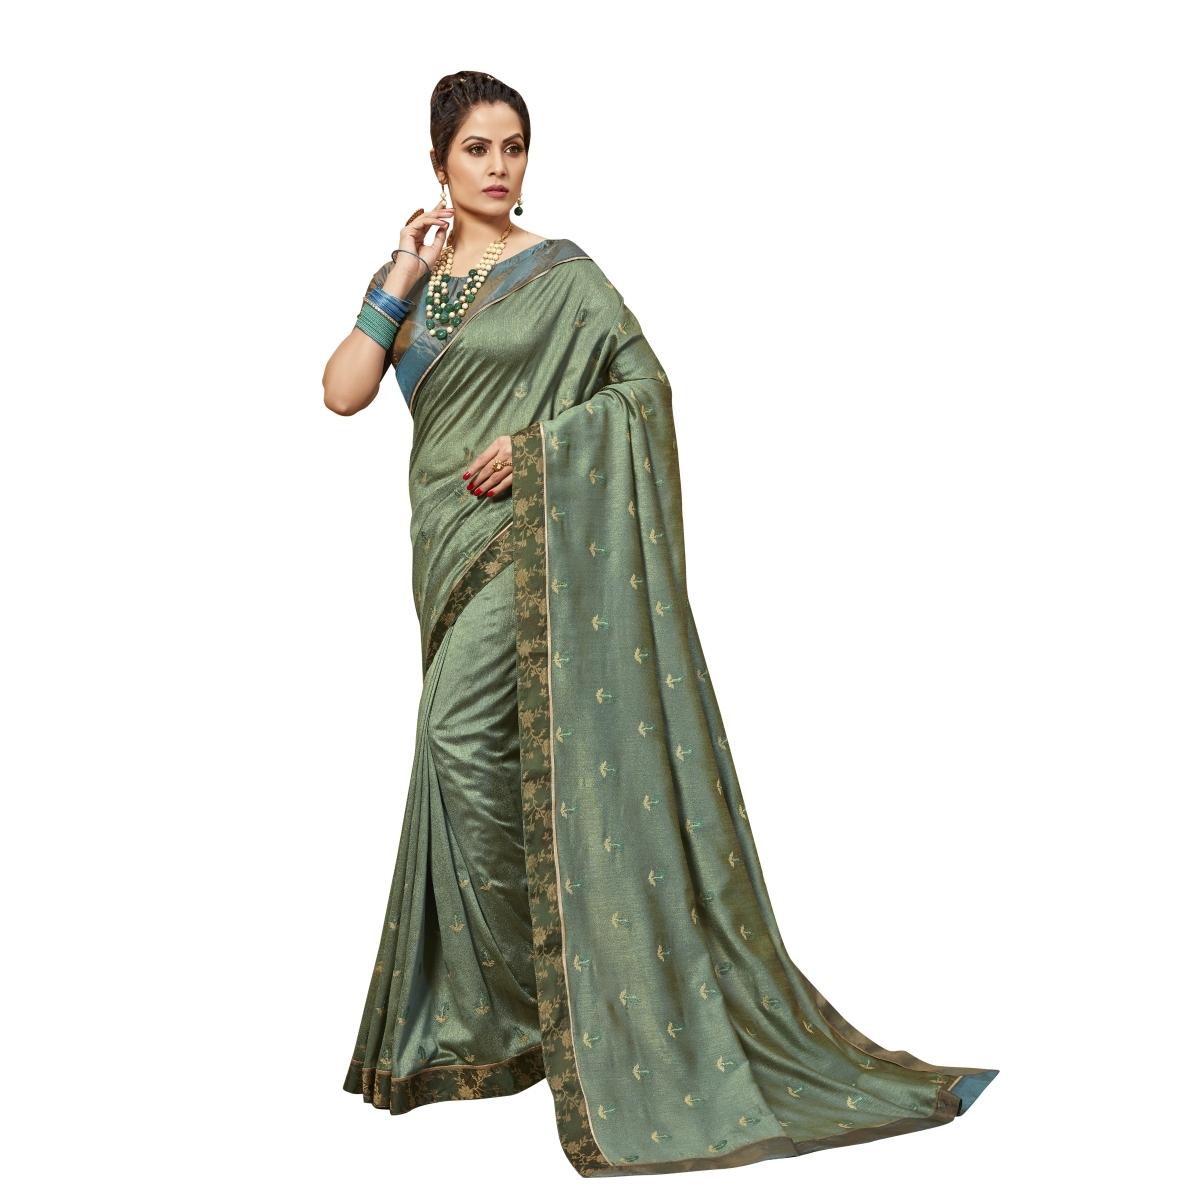 ea1fef319 Grey embroidered chanderi silk saree with blouse - De Marca - 2797172